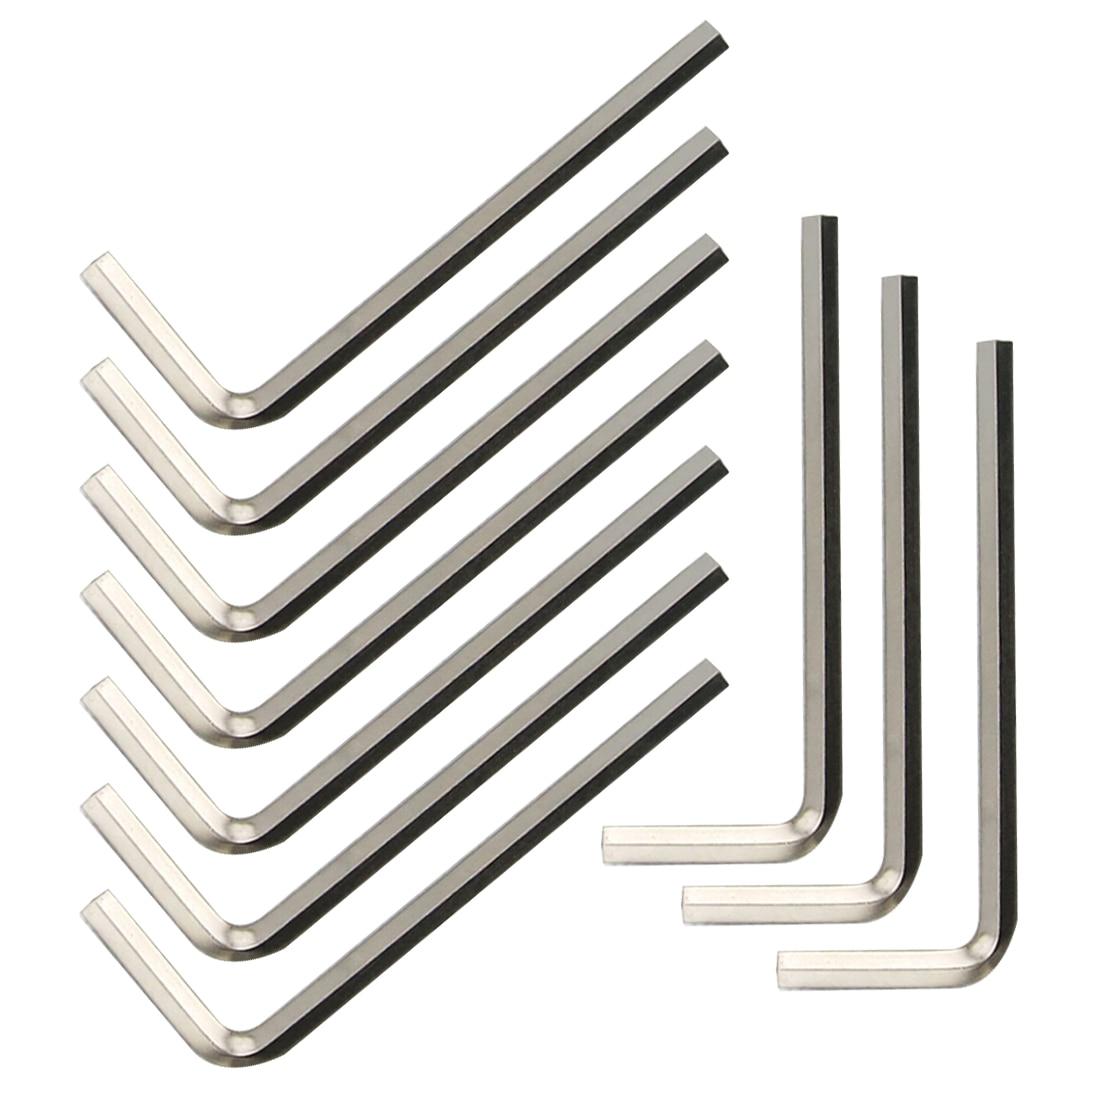 Allen Key M1.5 1.5mm Hex Tool Qty 50 BLACK ALLOY STEEL  Metric Short Arm